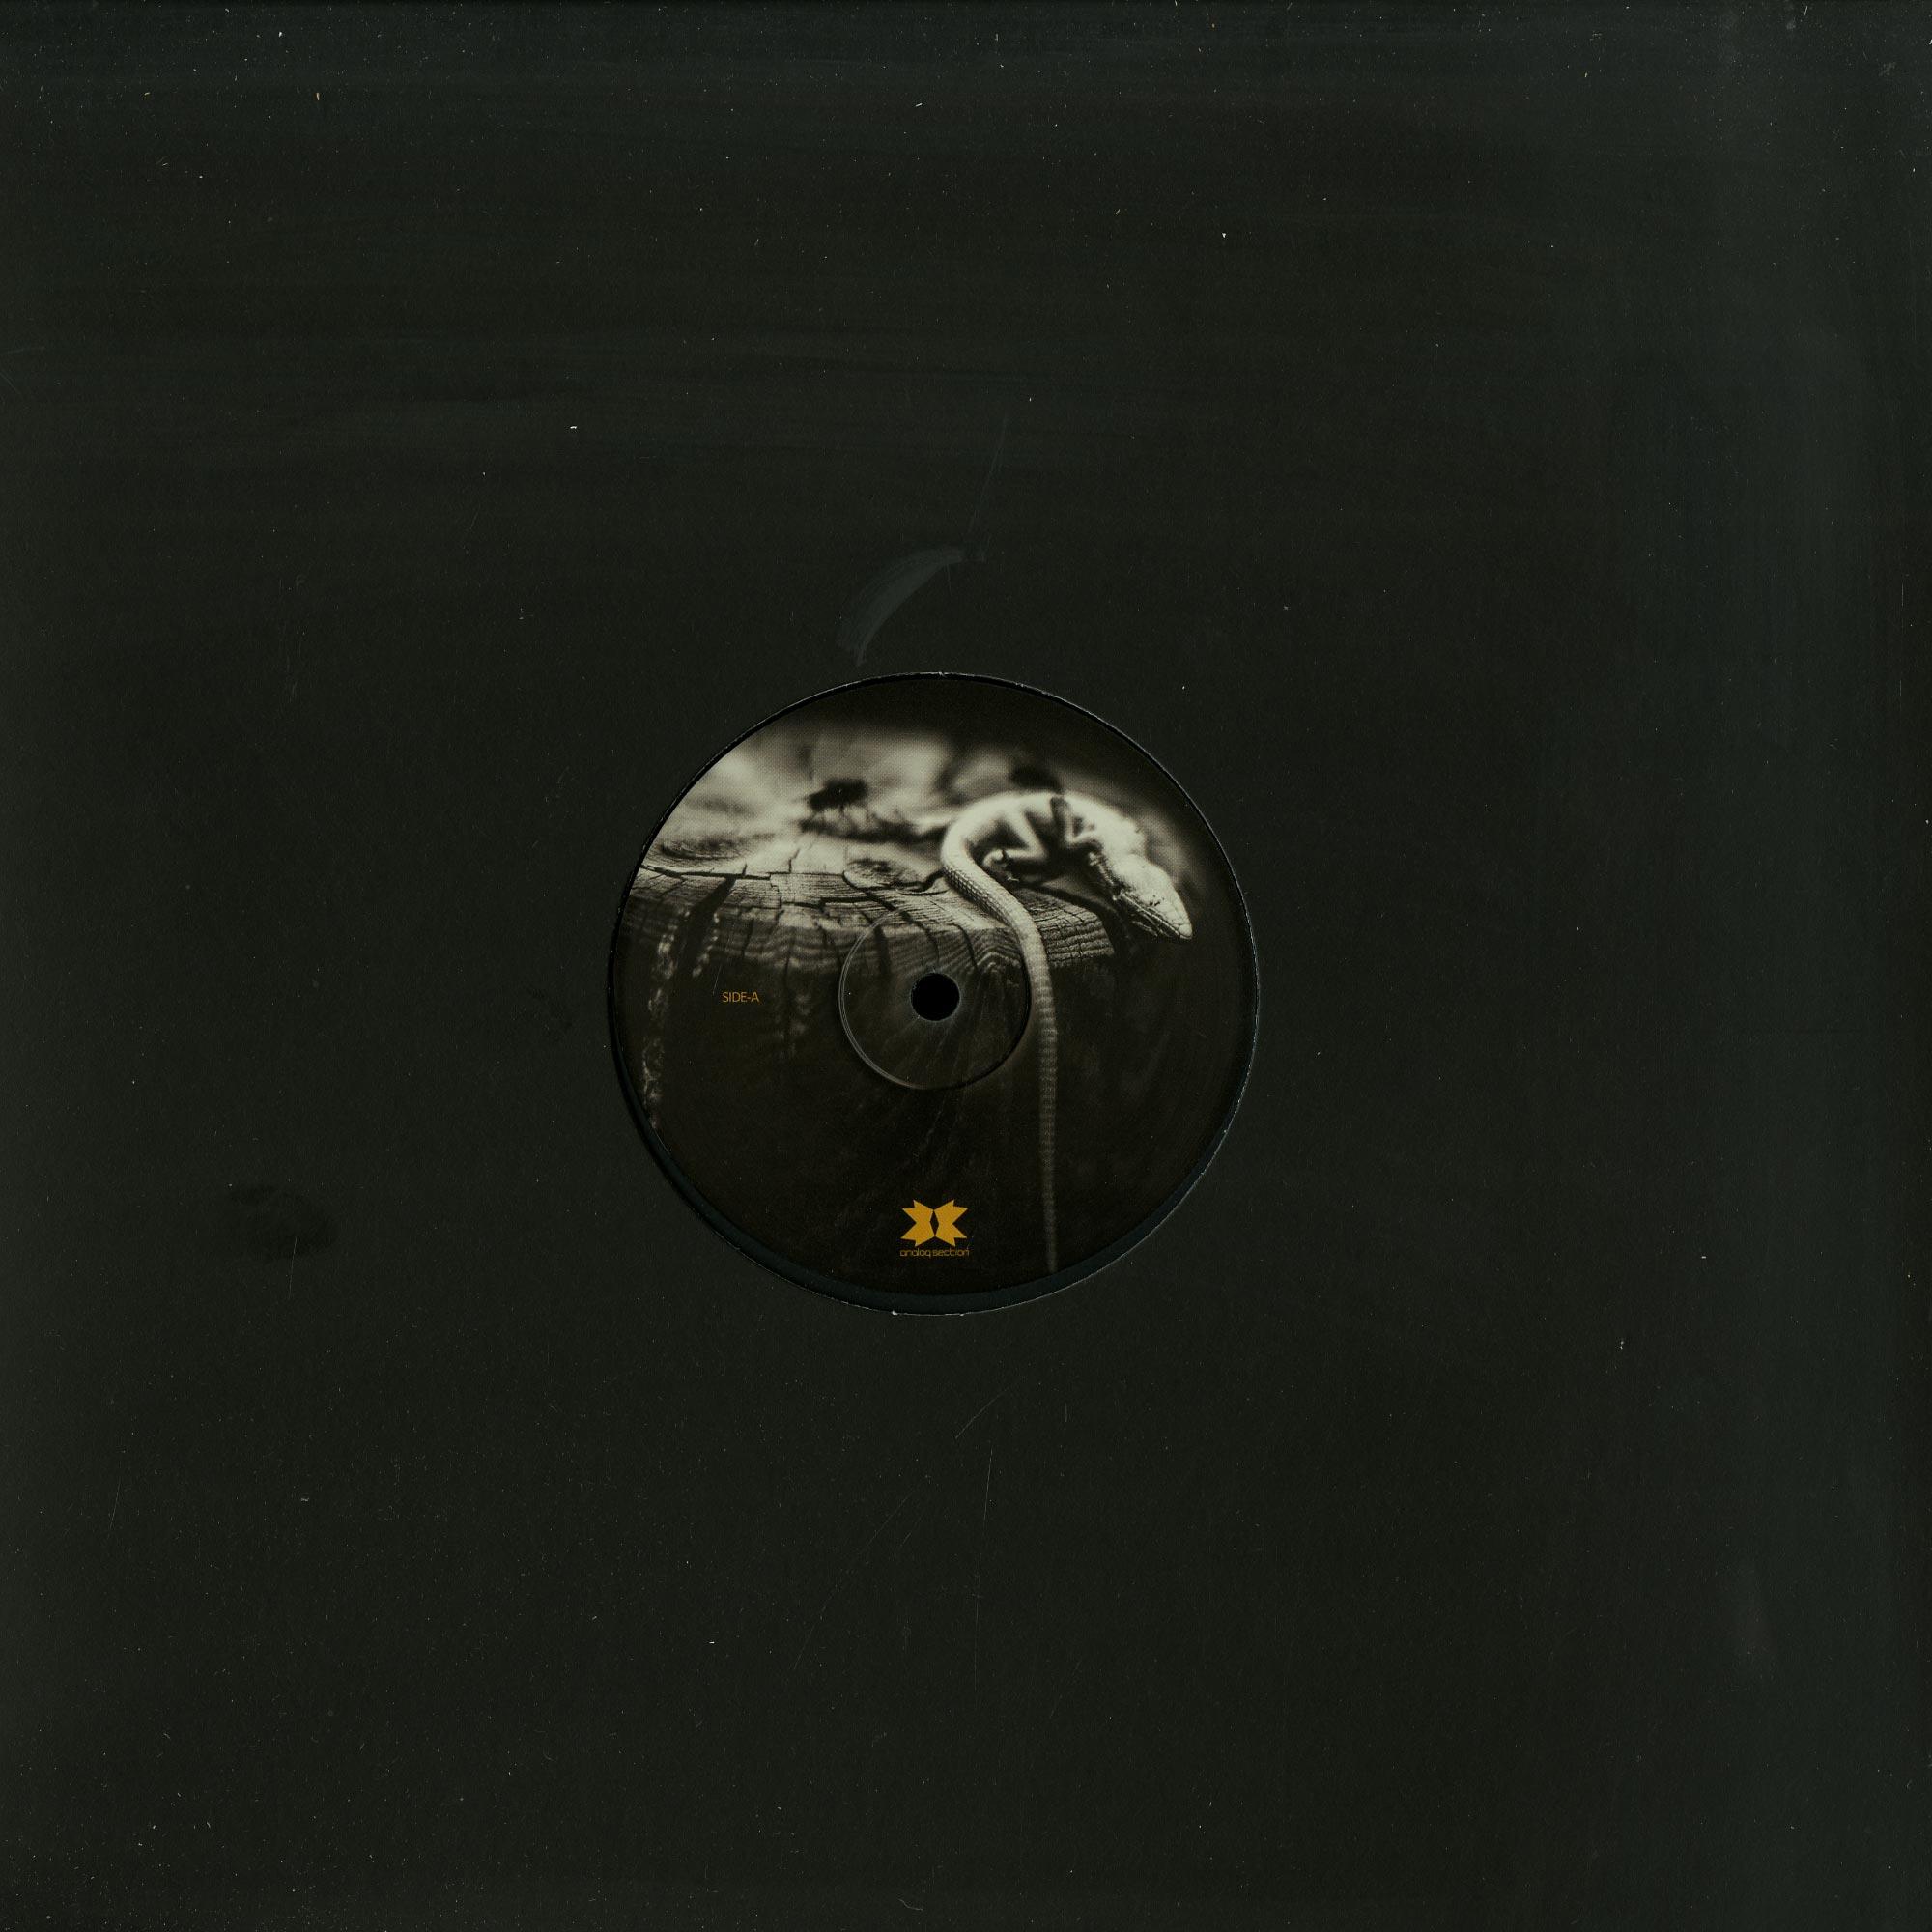 Joton / Sarf / Pulse One / Kalter Ende - THE BEGINNING EP